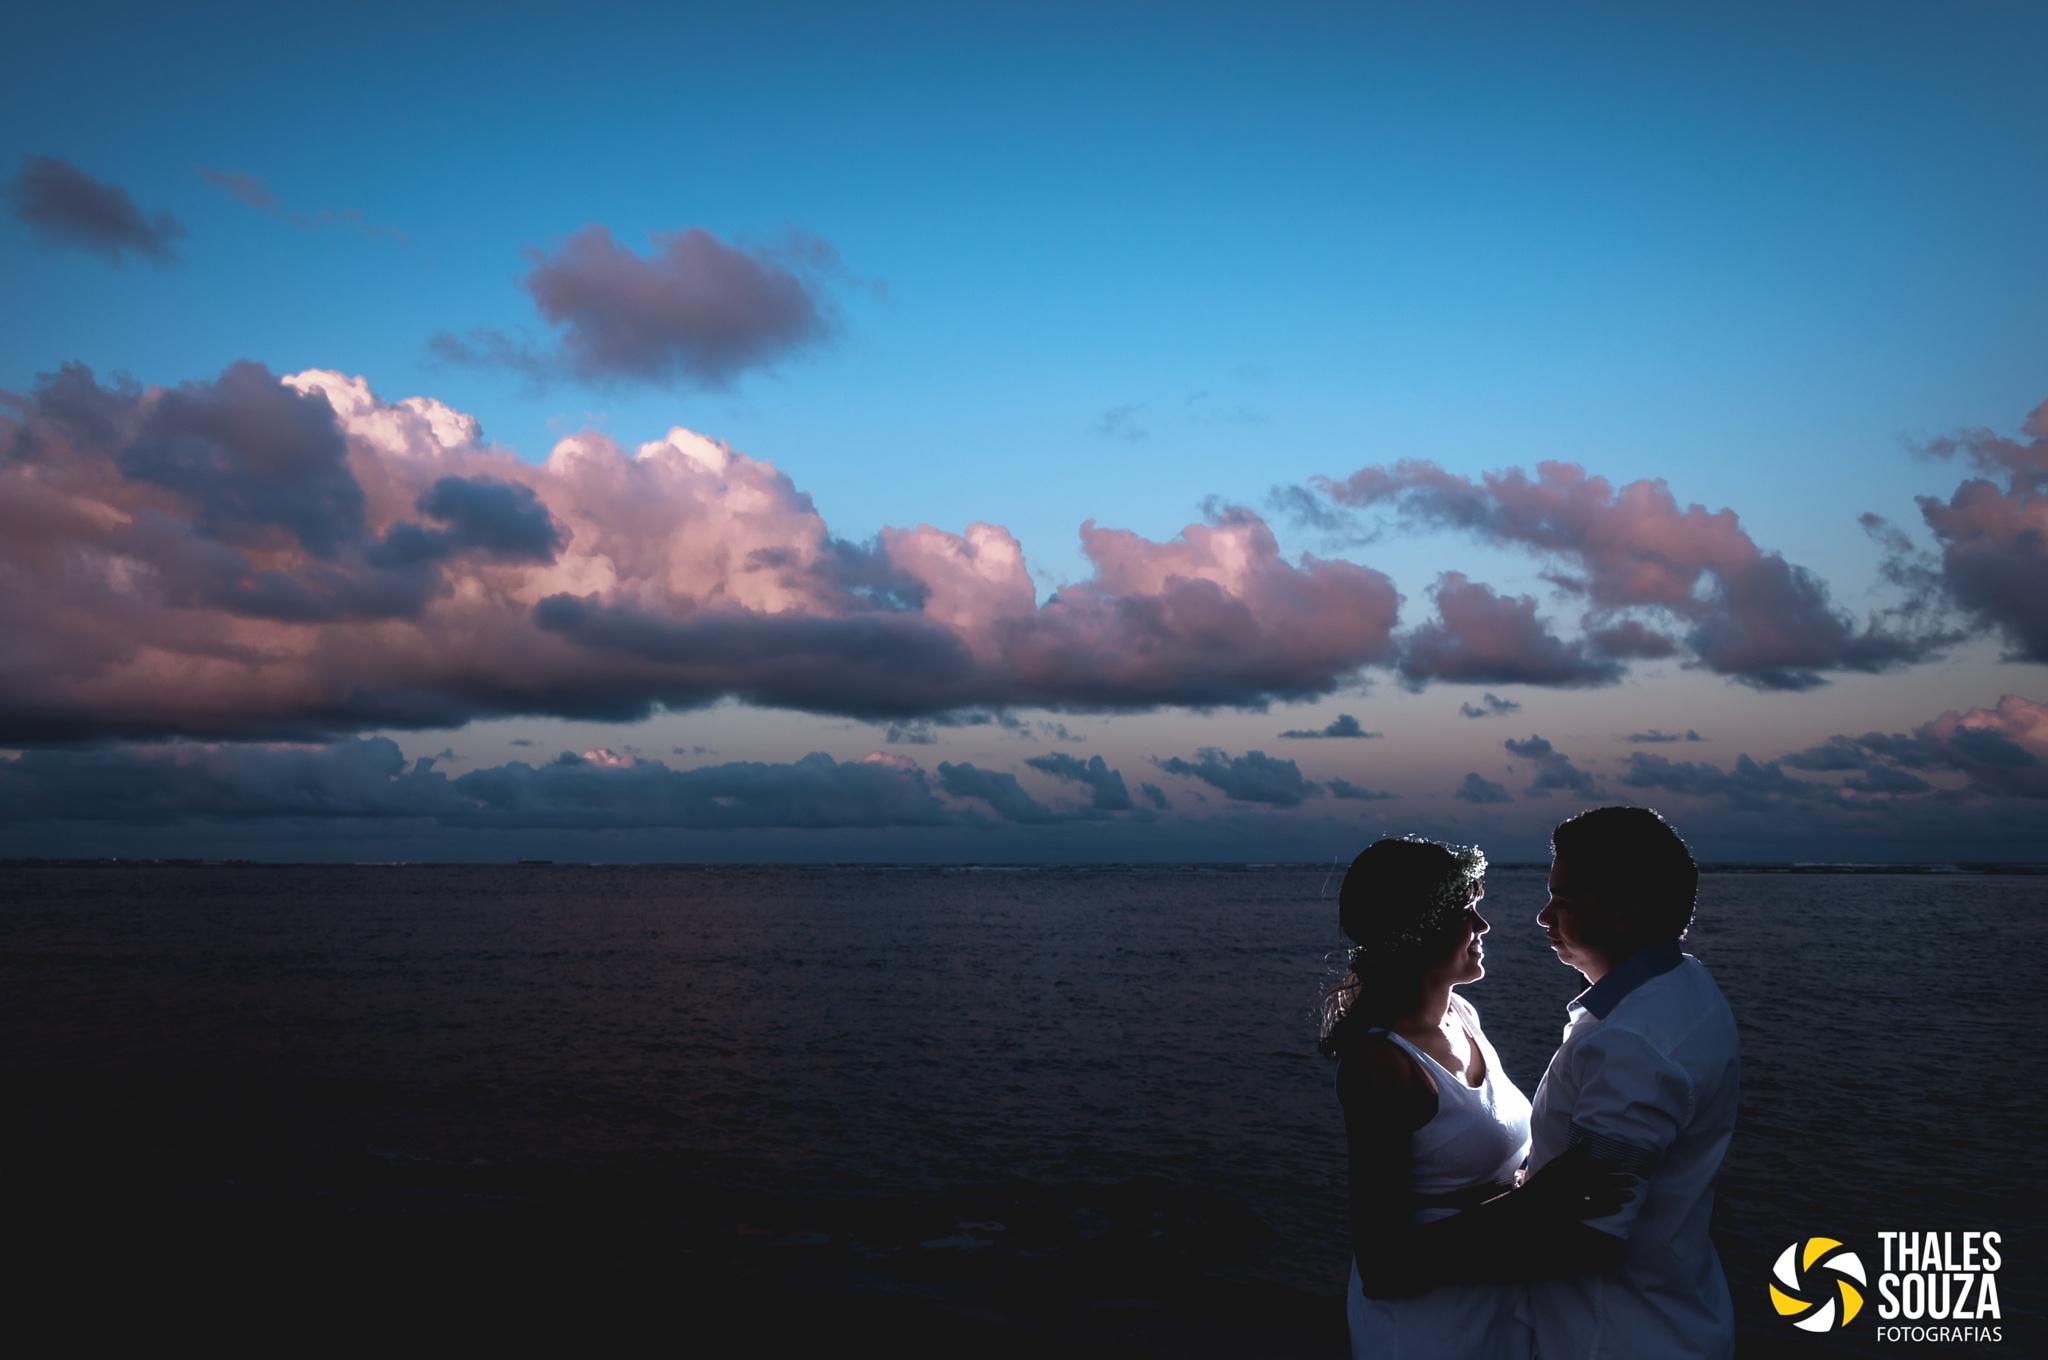 Pré-Wedding - Elida e Ibeneias by Thales Souza